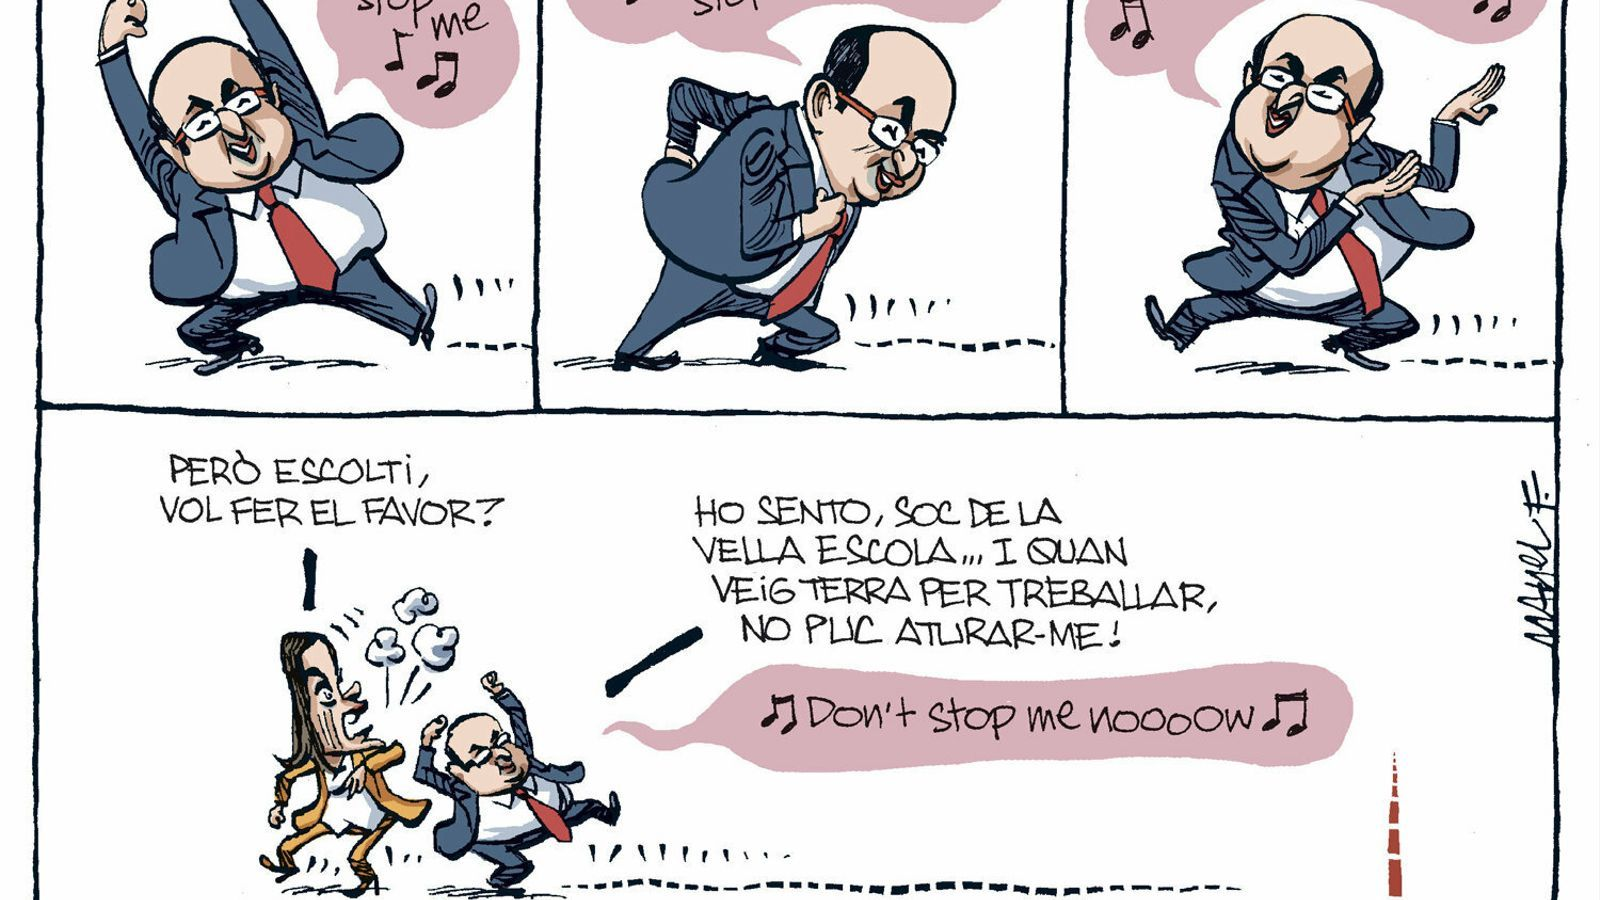 La vinyeta de Manel Fontdevila 24/11/2019